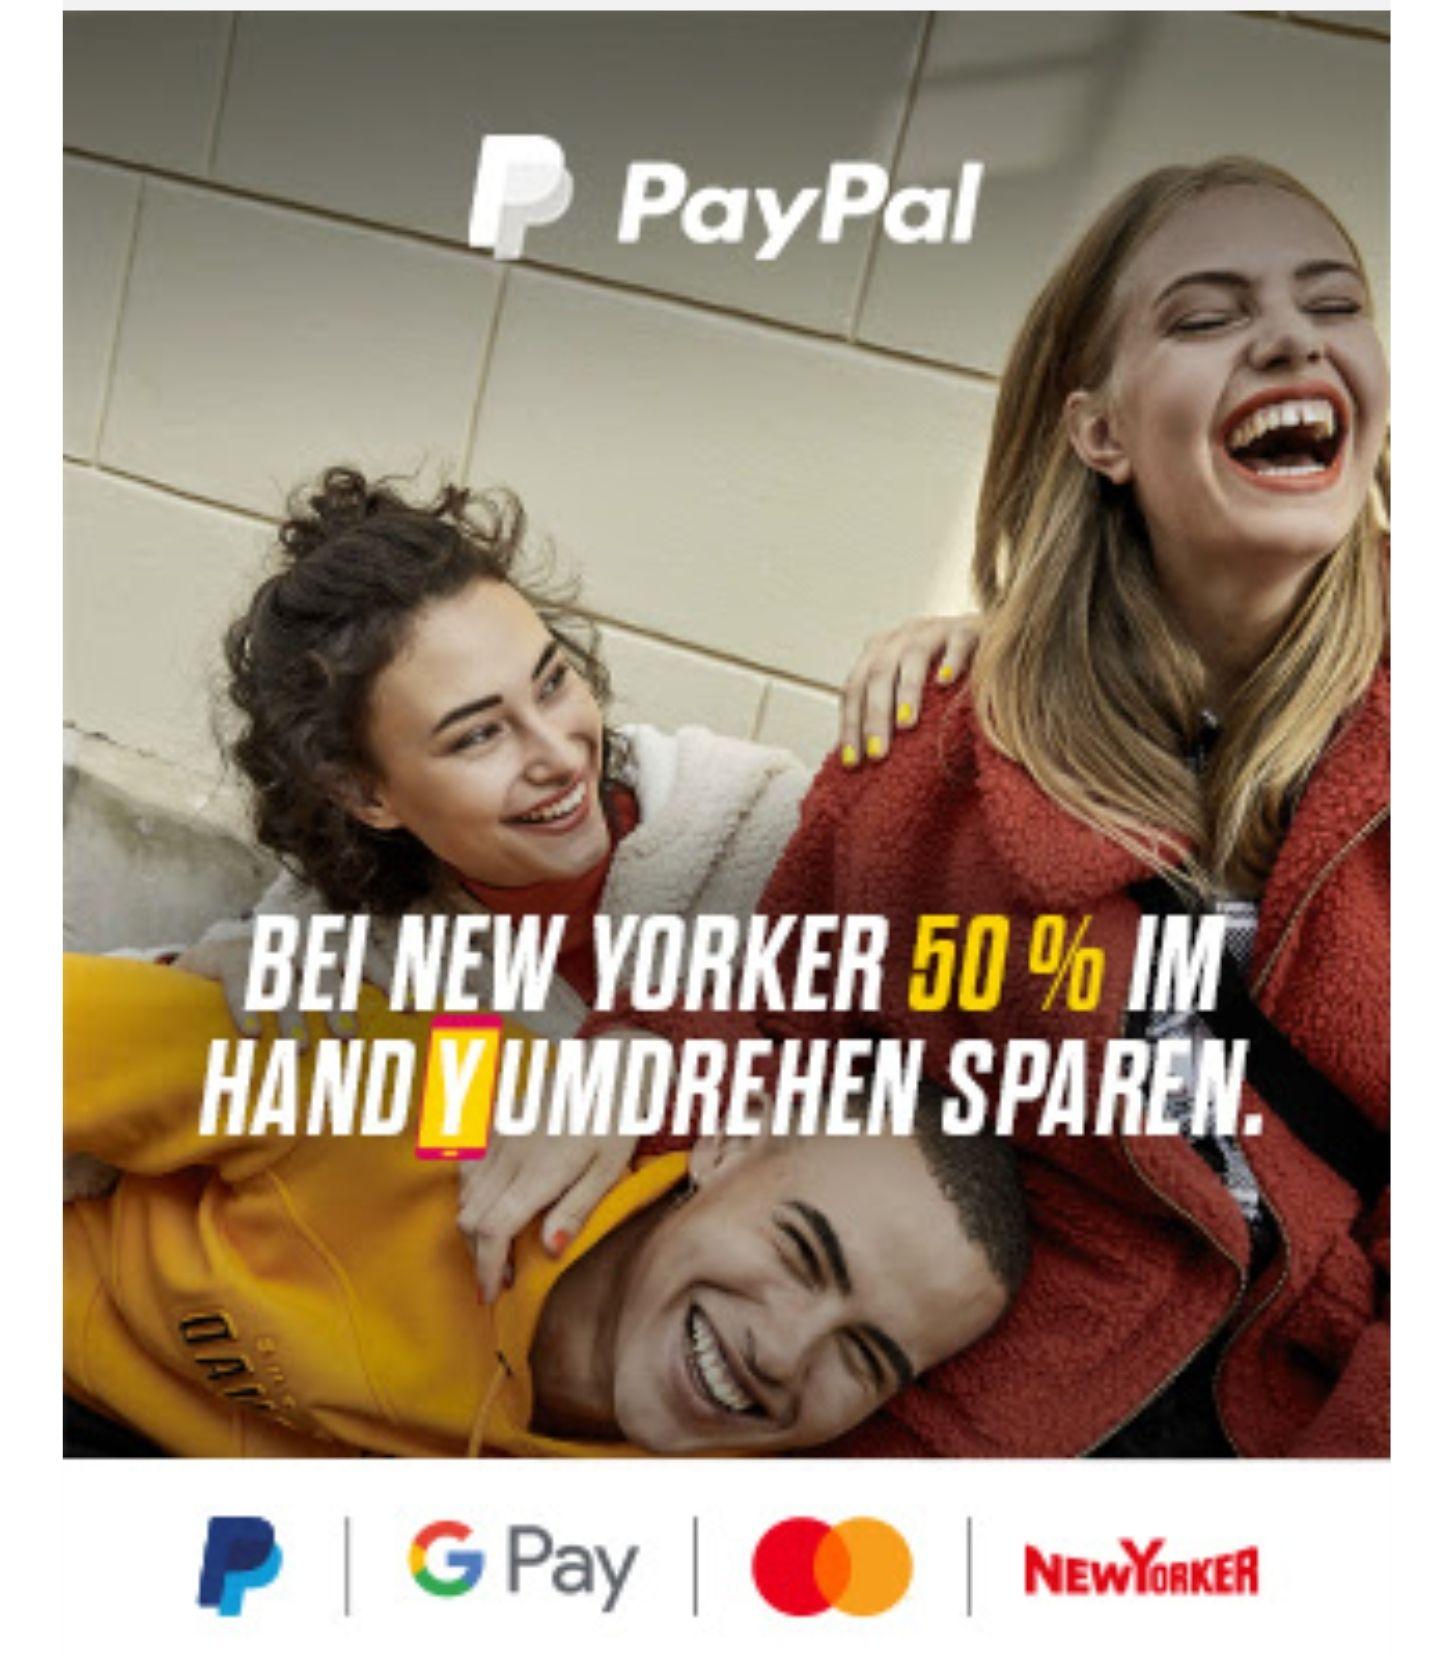 50 % Rabatt bei New Yorker mit Google Pay/Apple Pay/Garmin Pay (über Mastercard) ab 5. Dezember